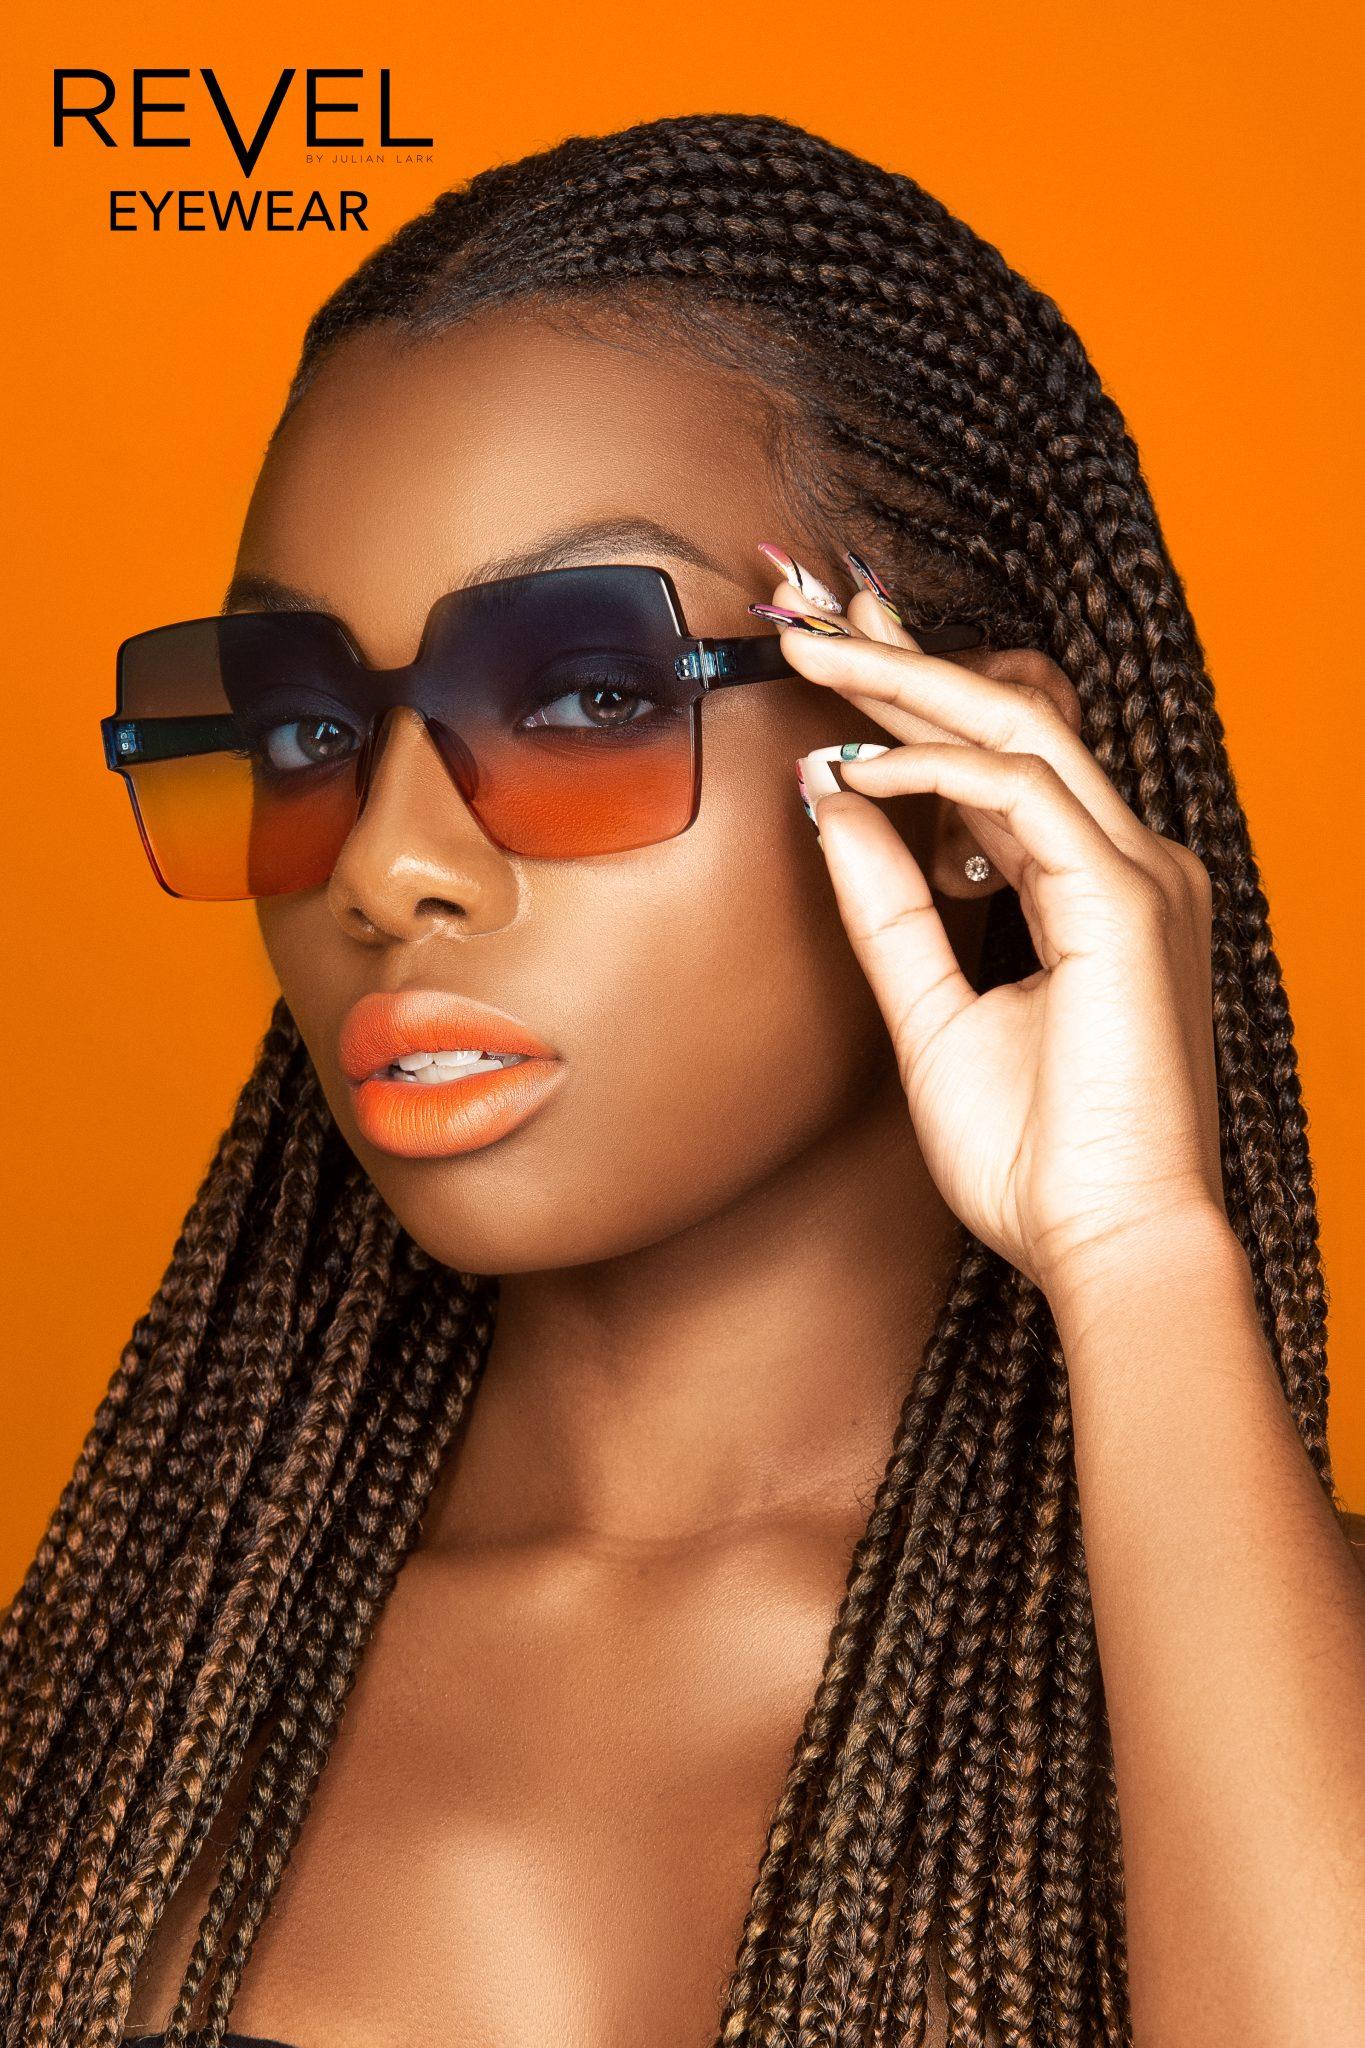 revel eyewear sunglasses